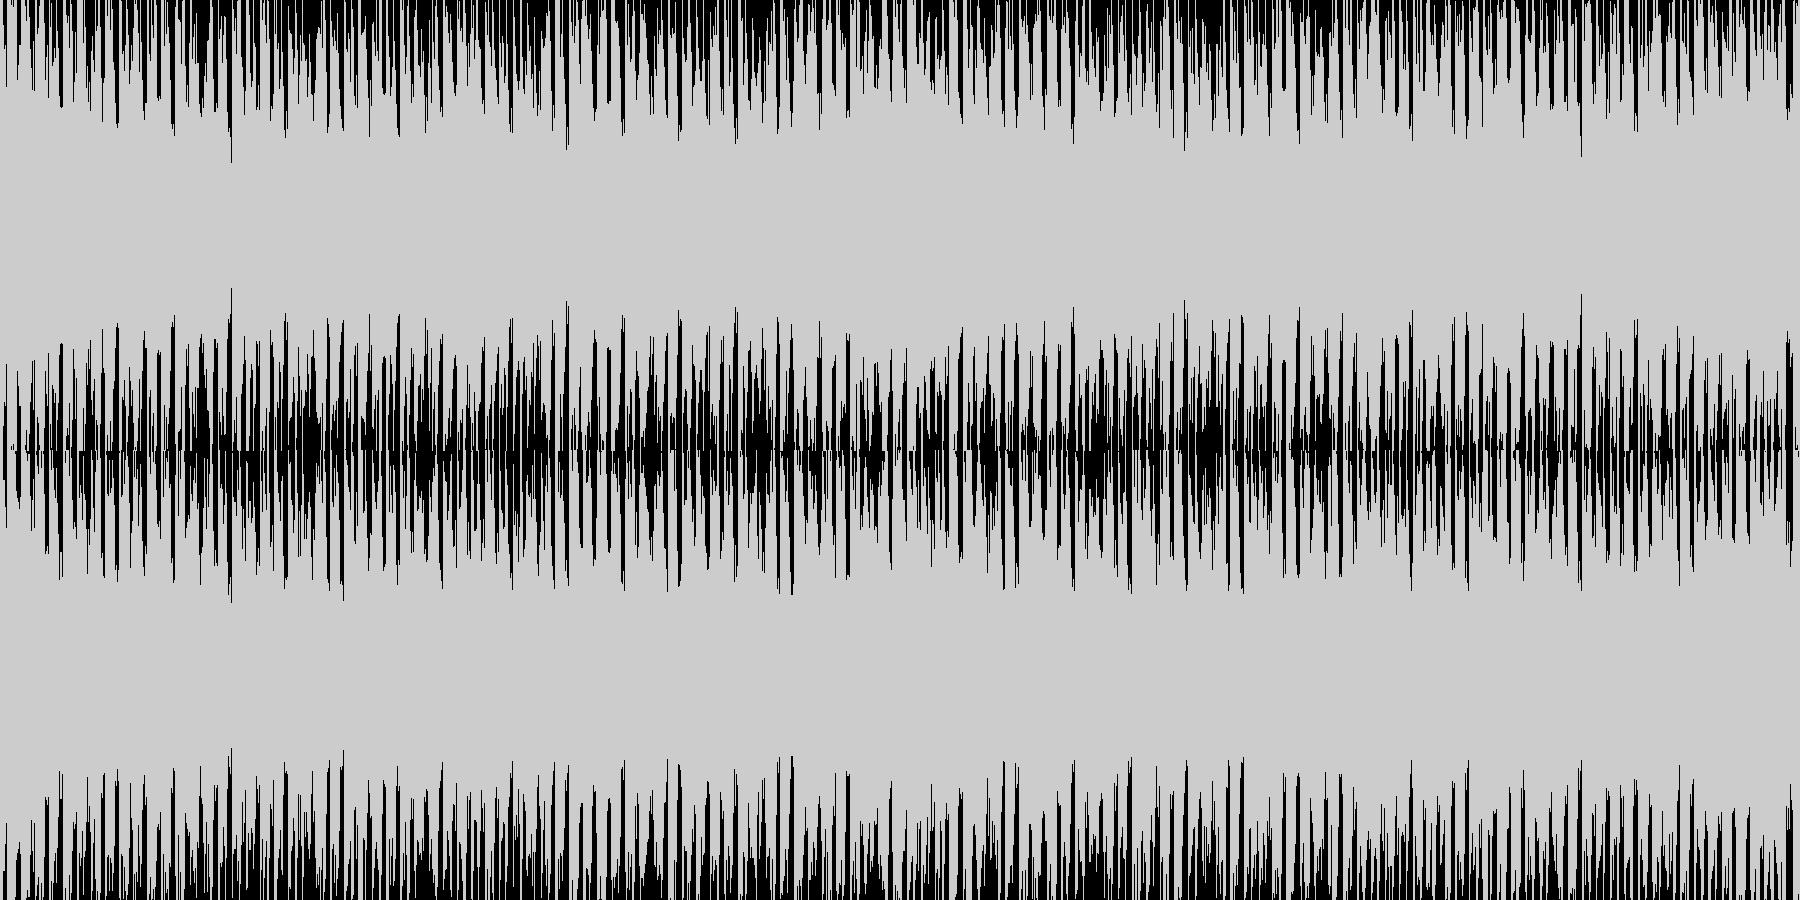 【EDMループ素材】企業・映像制作向きFの未再生の波形